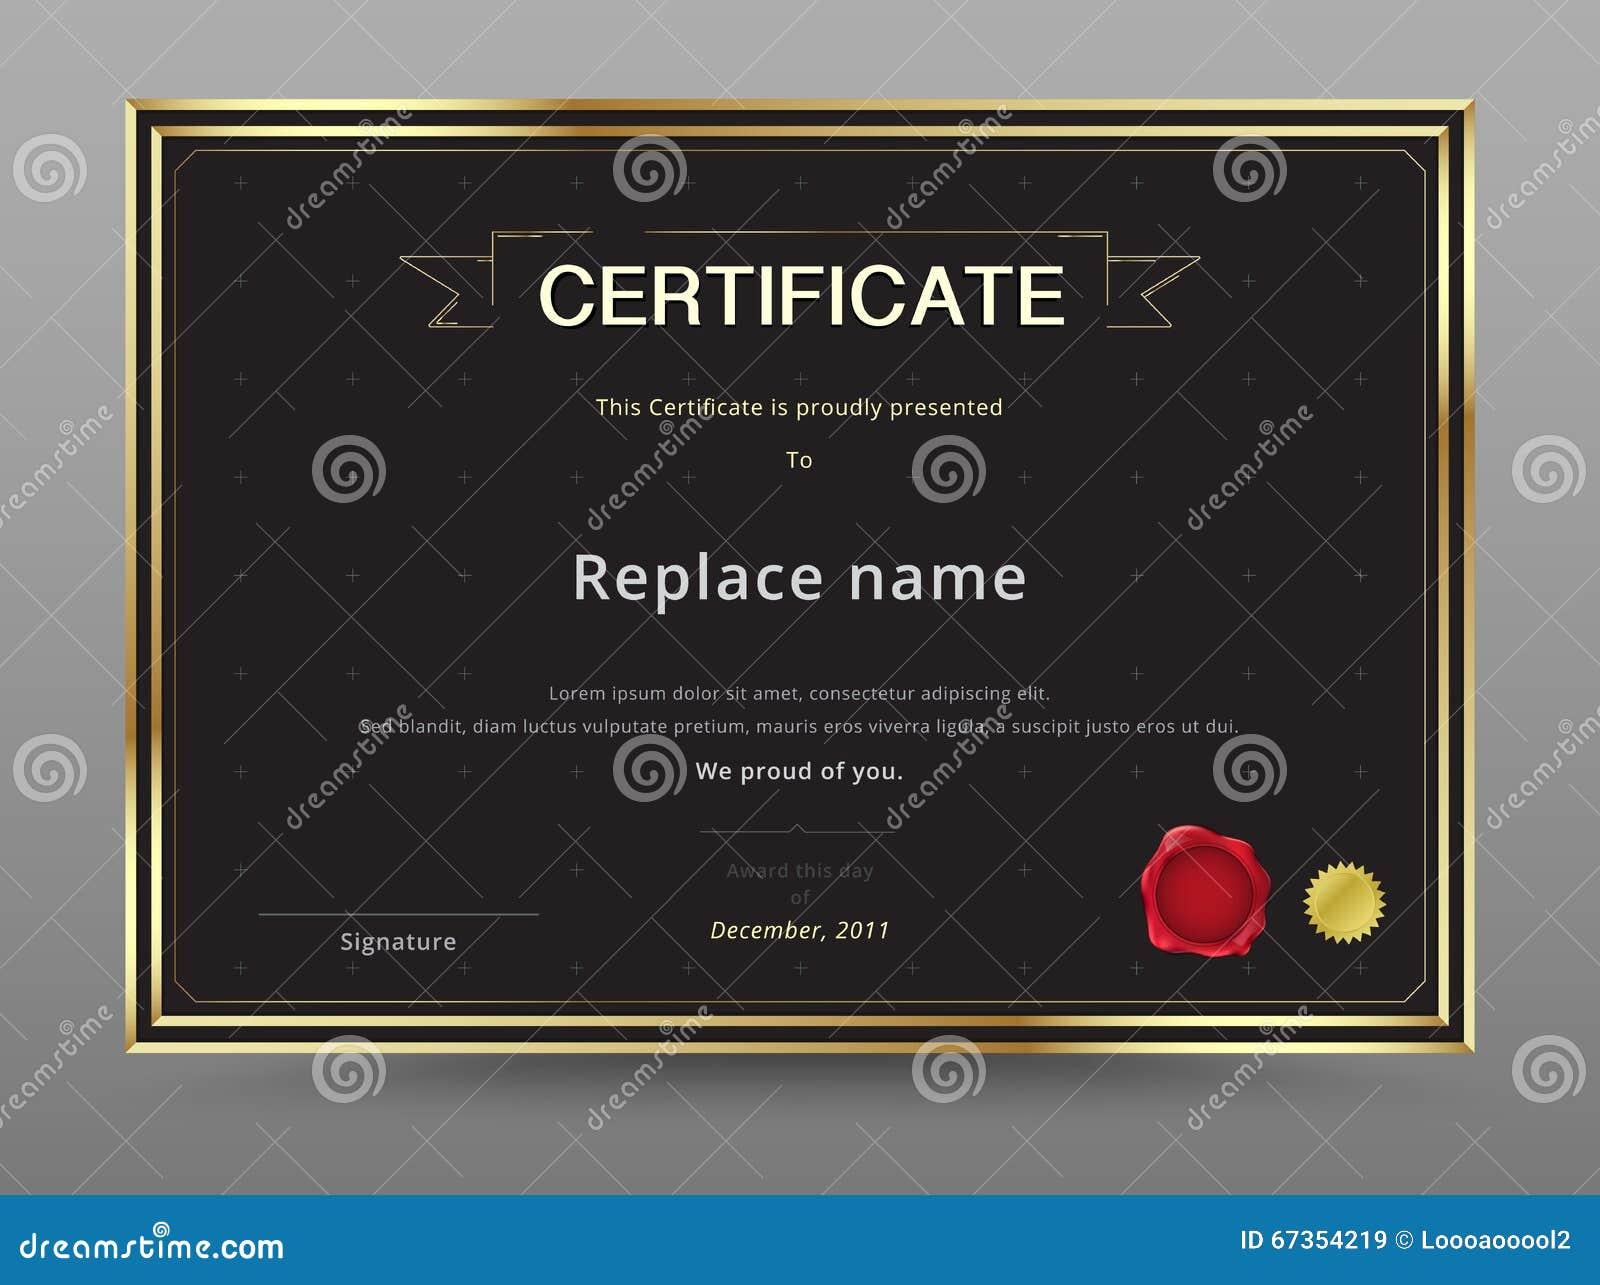 elegant certificate template design gold and black color vector